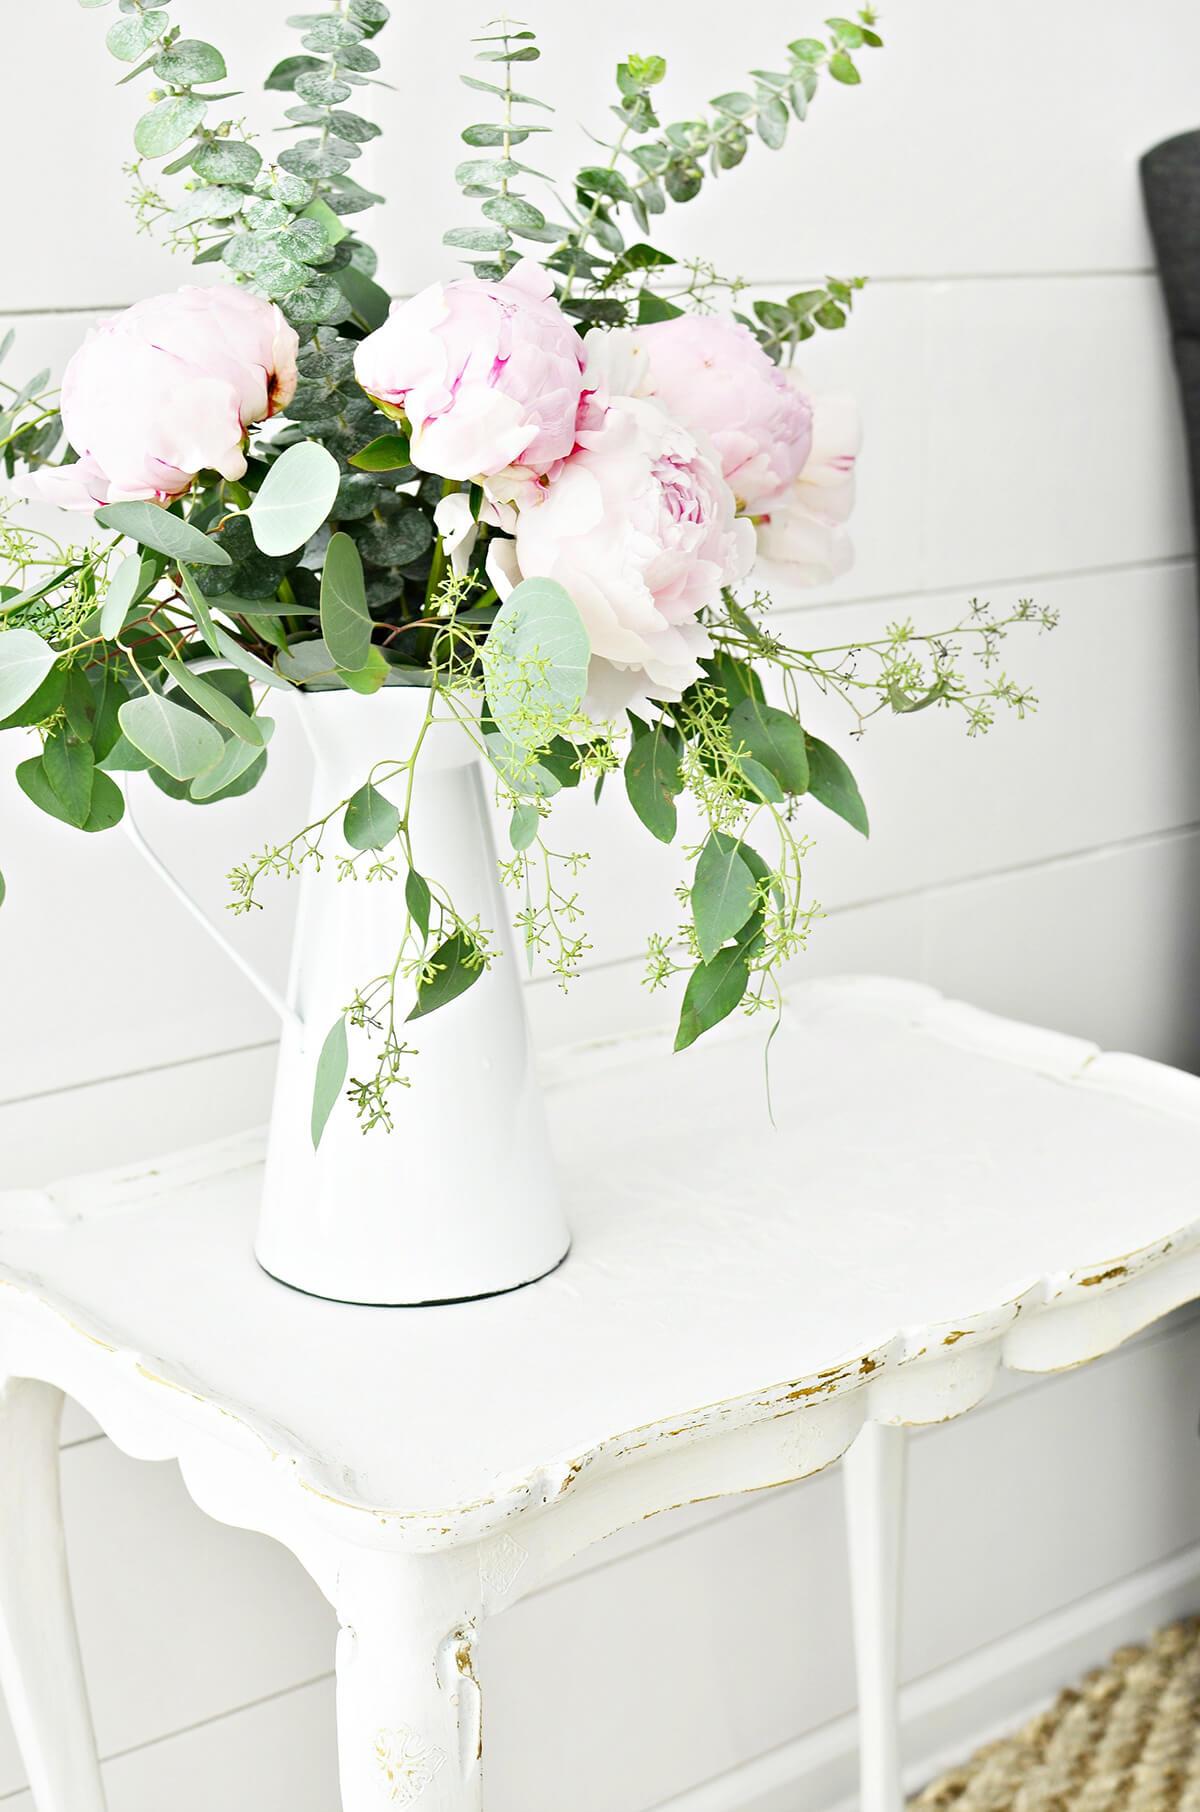 Elegant Vase with Pink Flowers